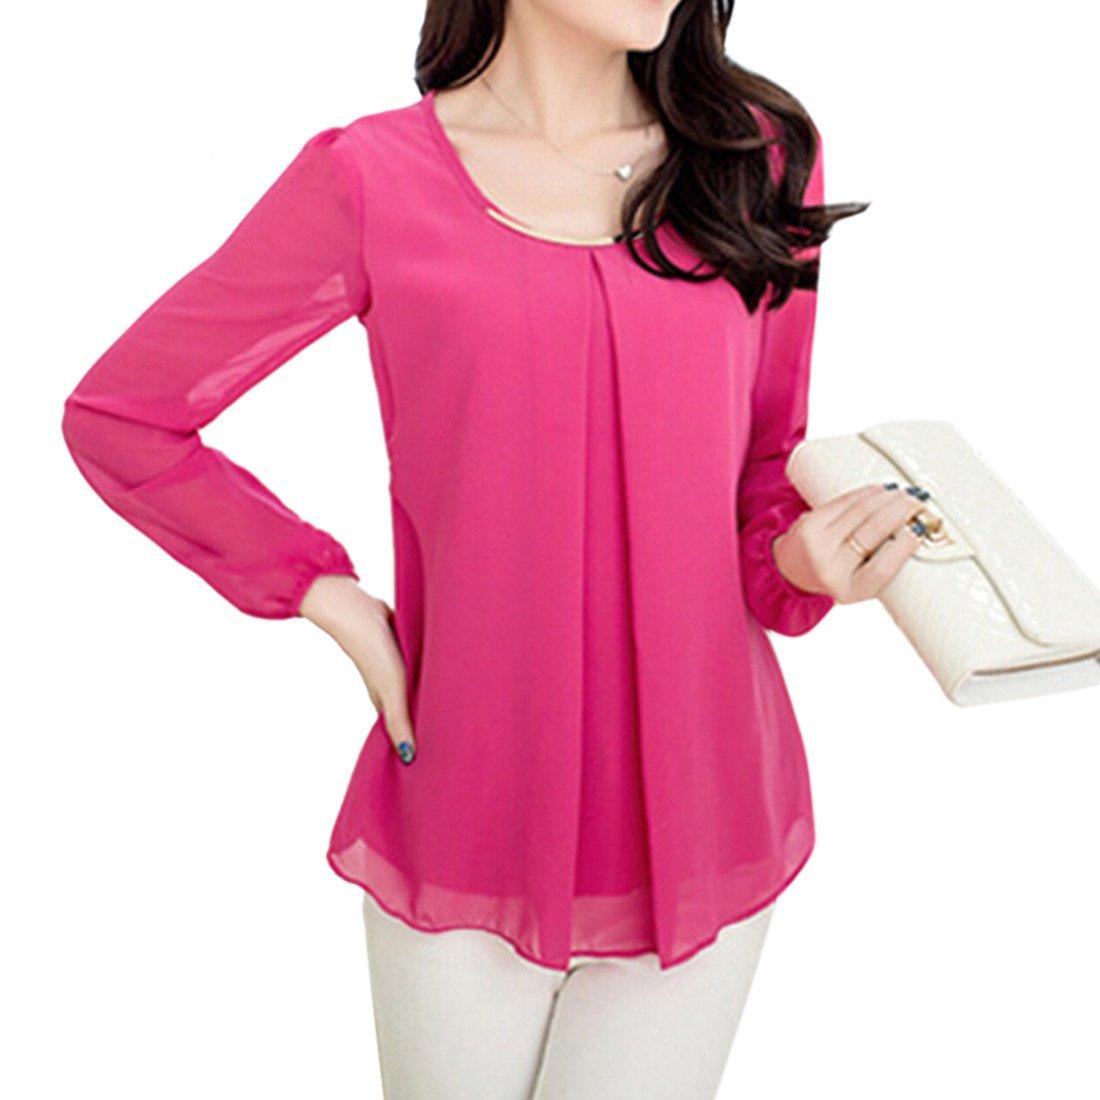 New Elegant Women's Loose Chiffon Tops Long Sleeve Shirt Casual Blouse WINSON